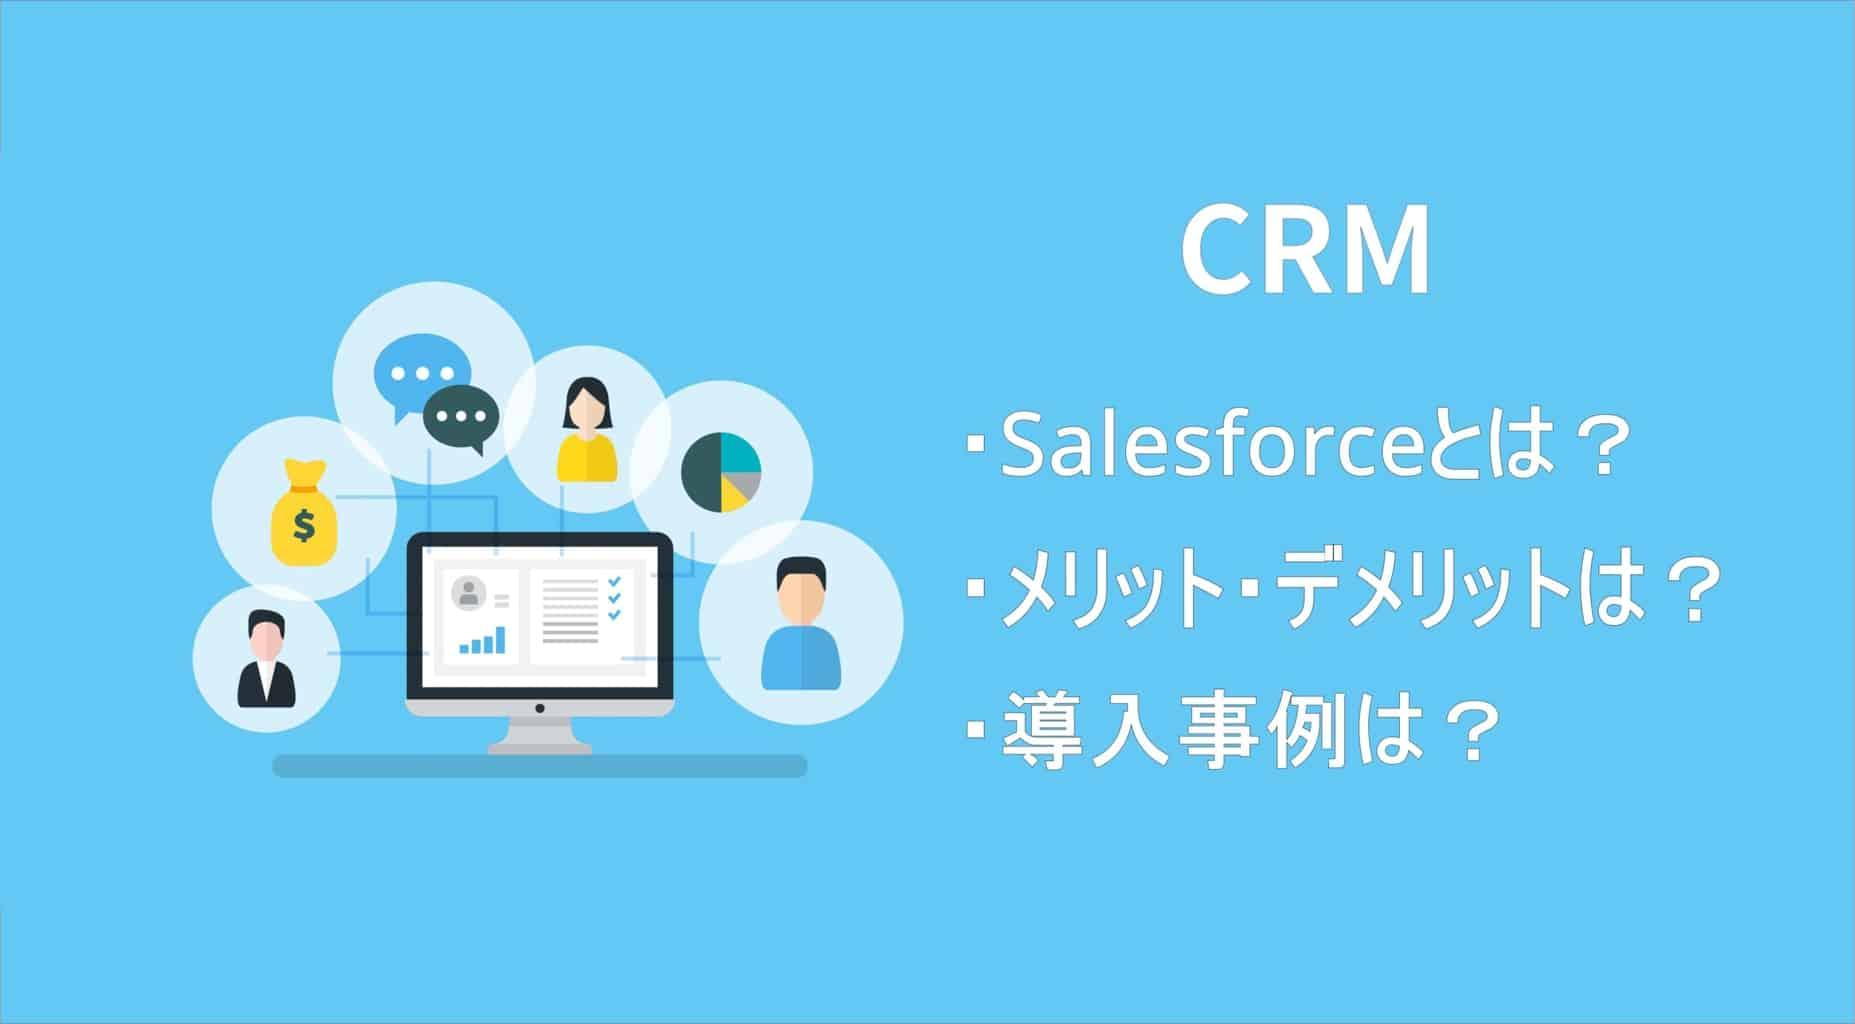 CRMツール『セールスフォース』とは?利用するメリット・デメリットや導入事例も紹介!